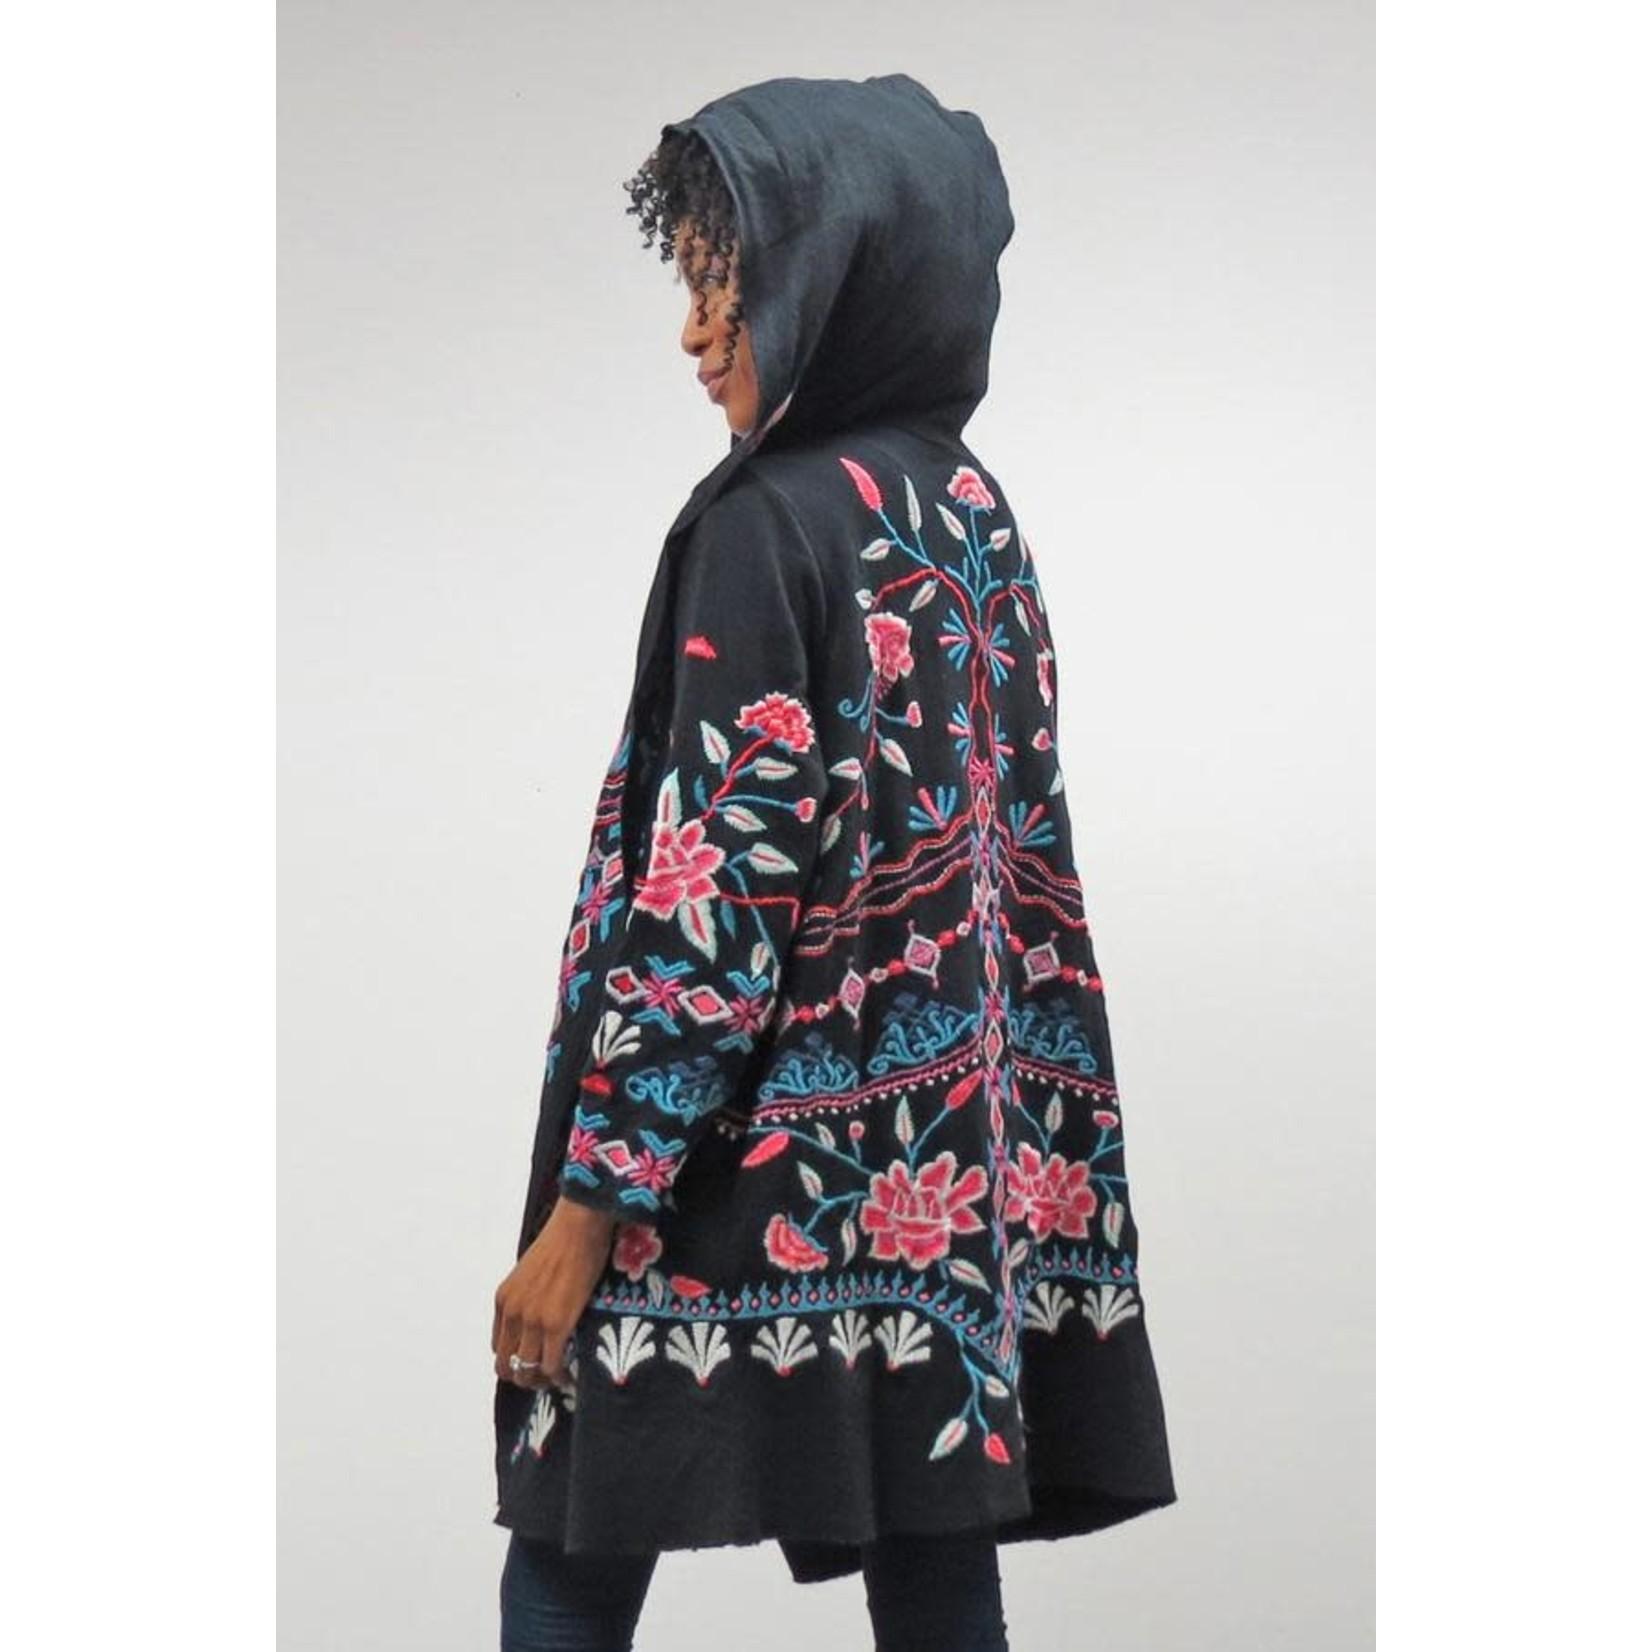 Caite Billie Hooded Cardigan w/ Indian Floral Design